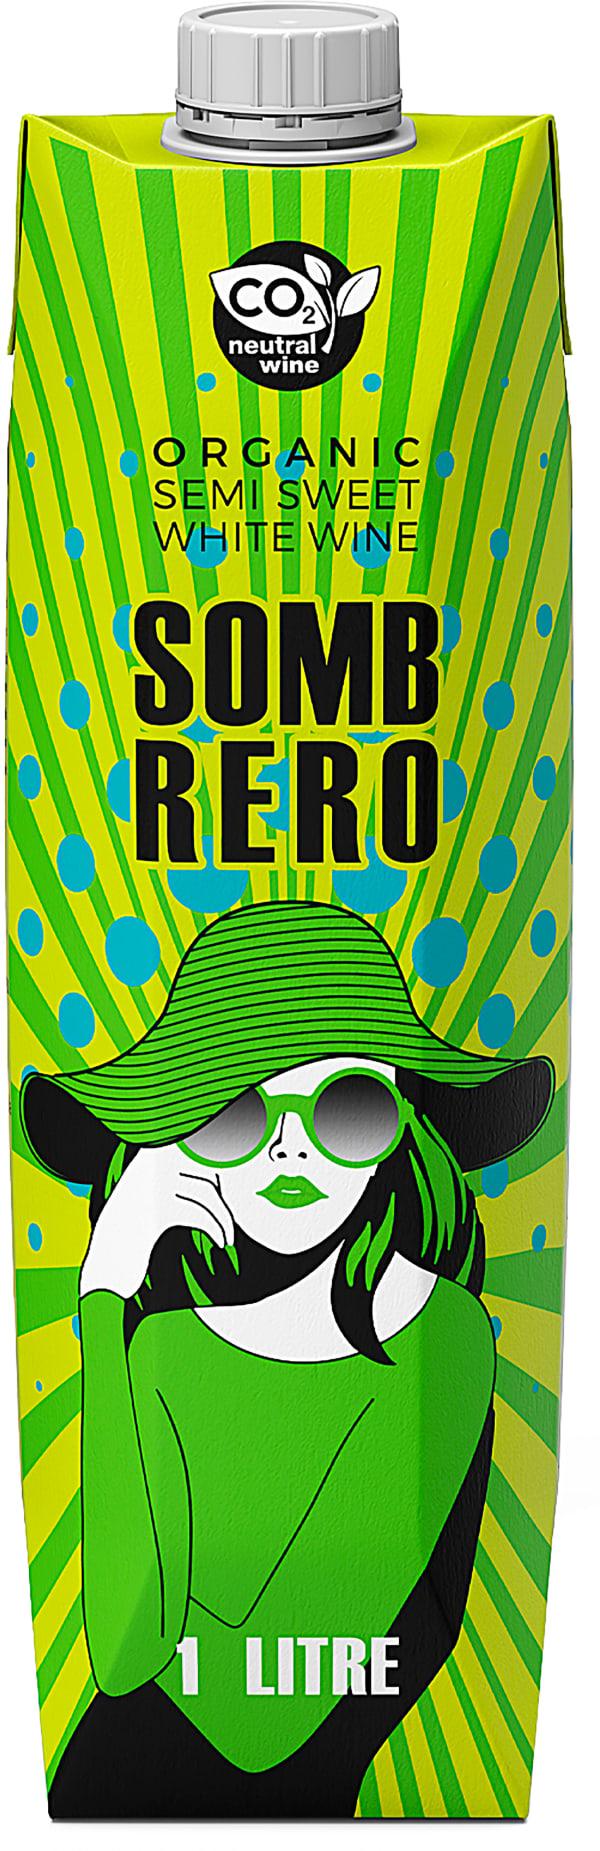 Sombrero Semi Sweet Organic 2020 carton package